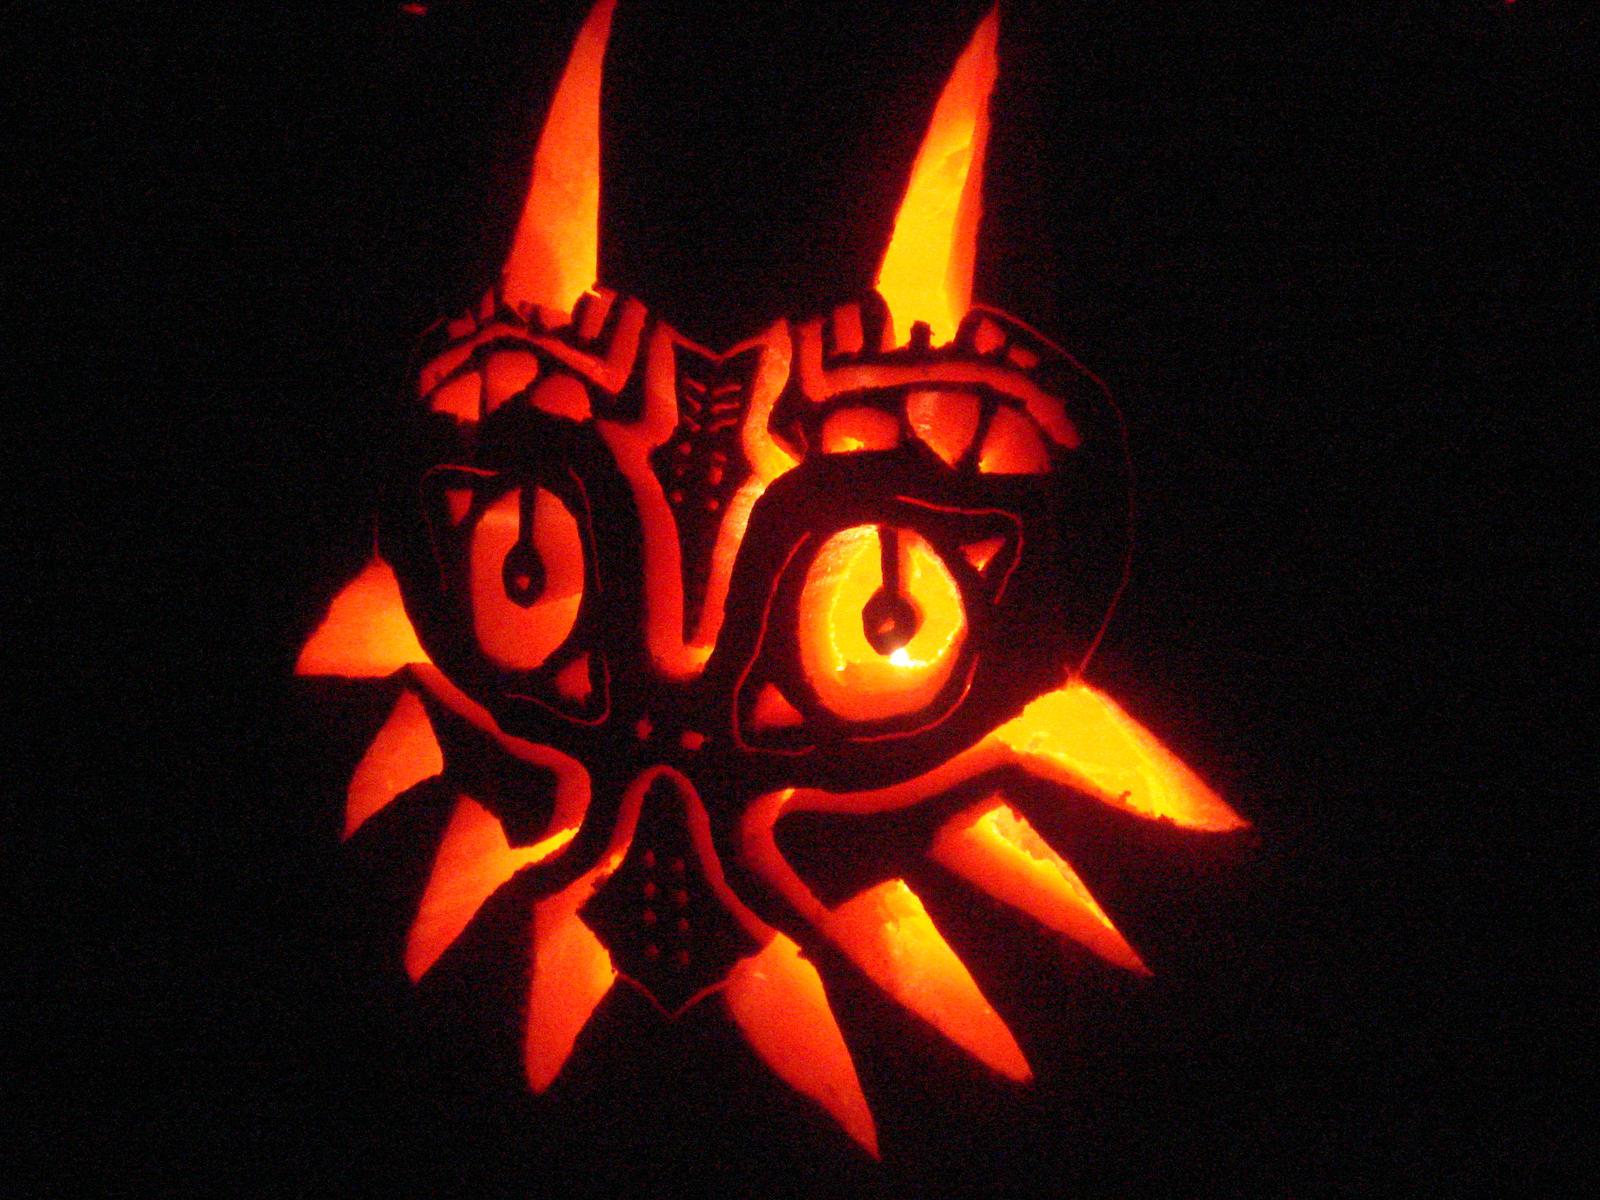 Majora s mask pumpkin carving by ph nt on deviantart